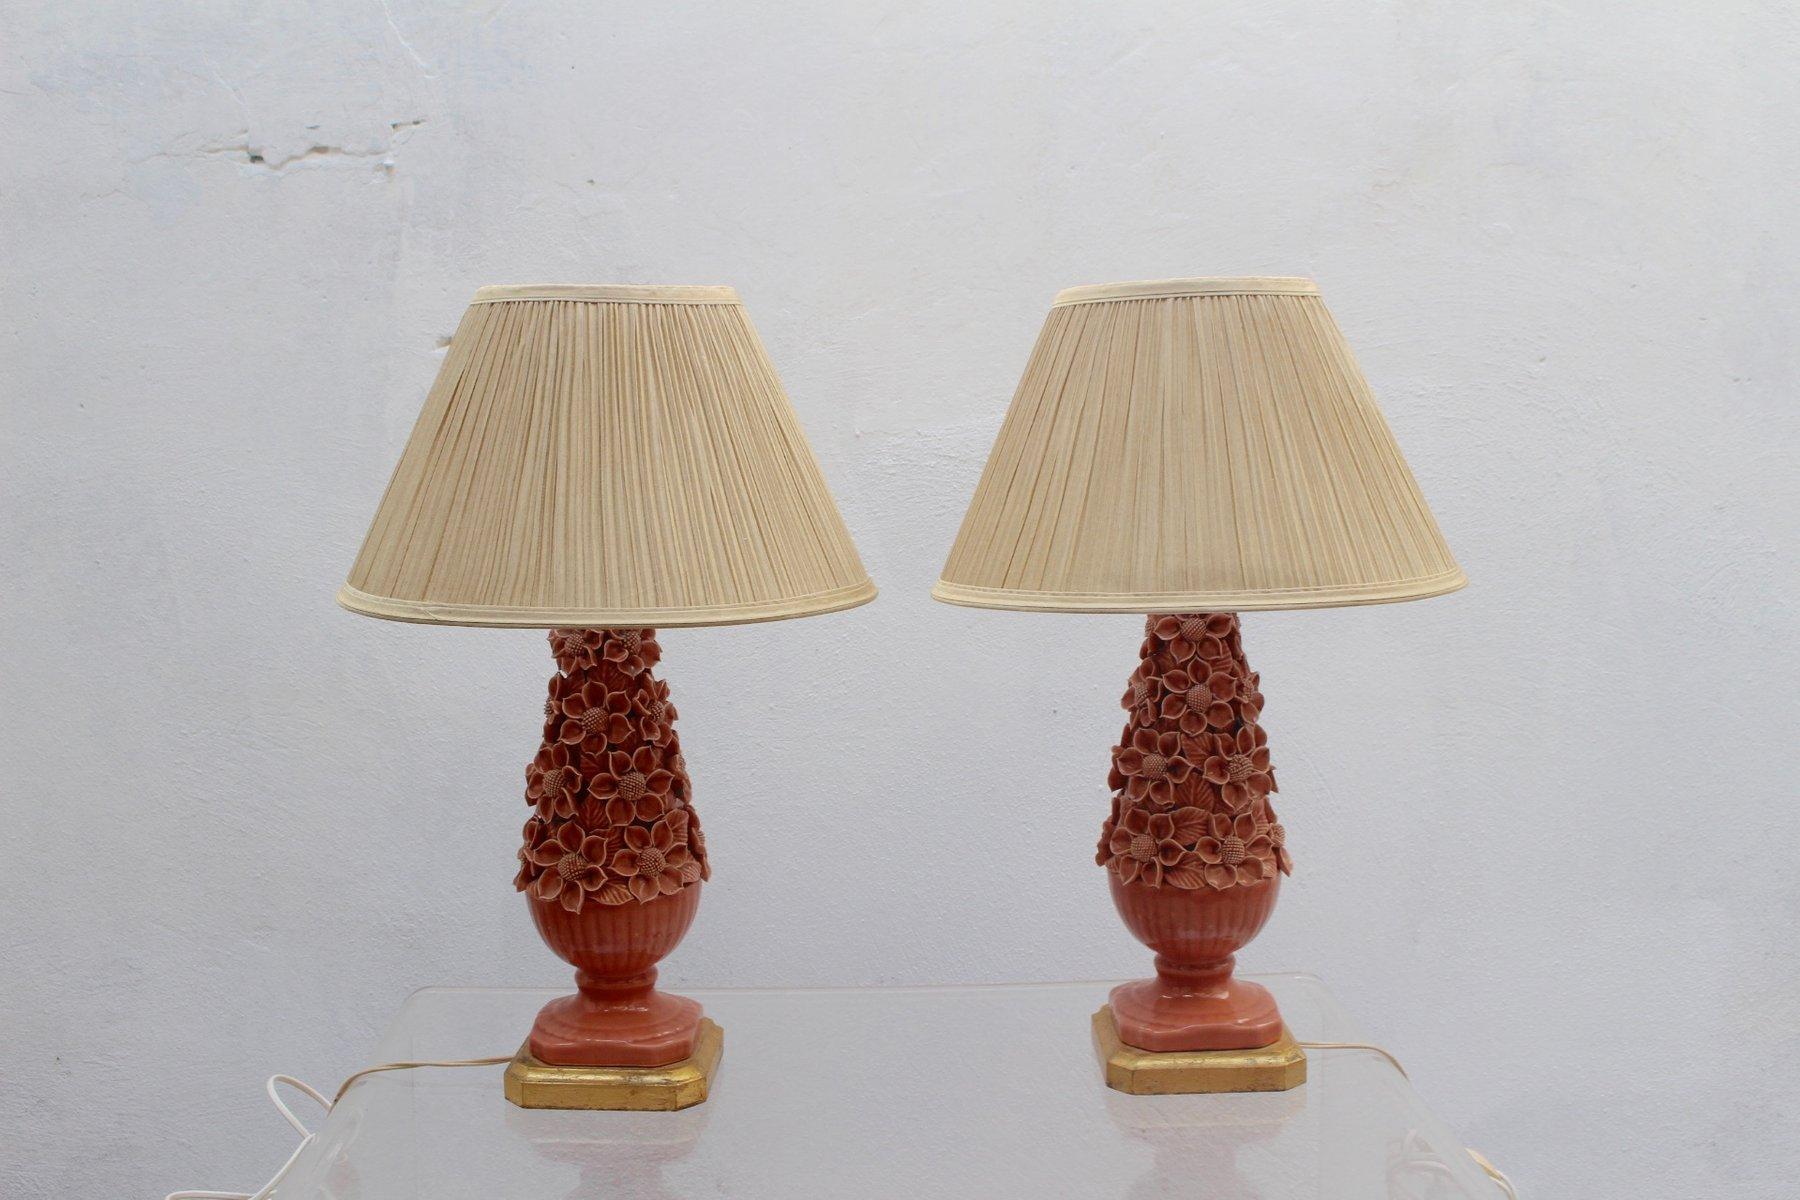 Tischlampen aus Keramik, 1950er, 2er Set